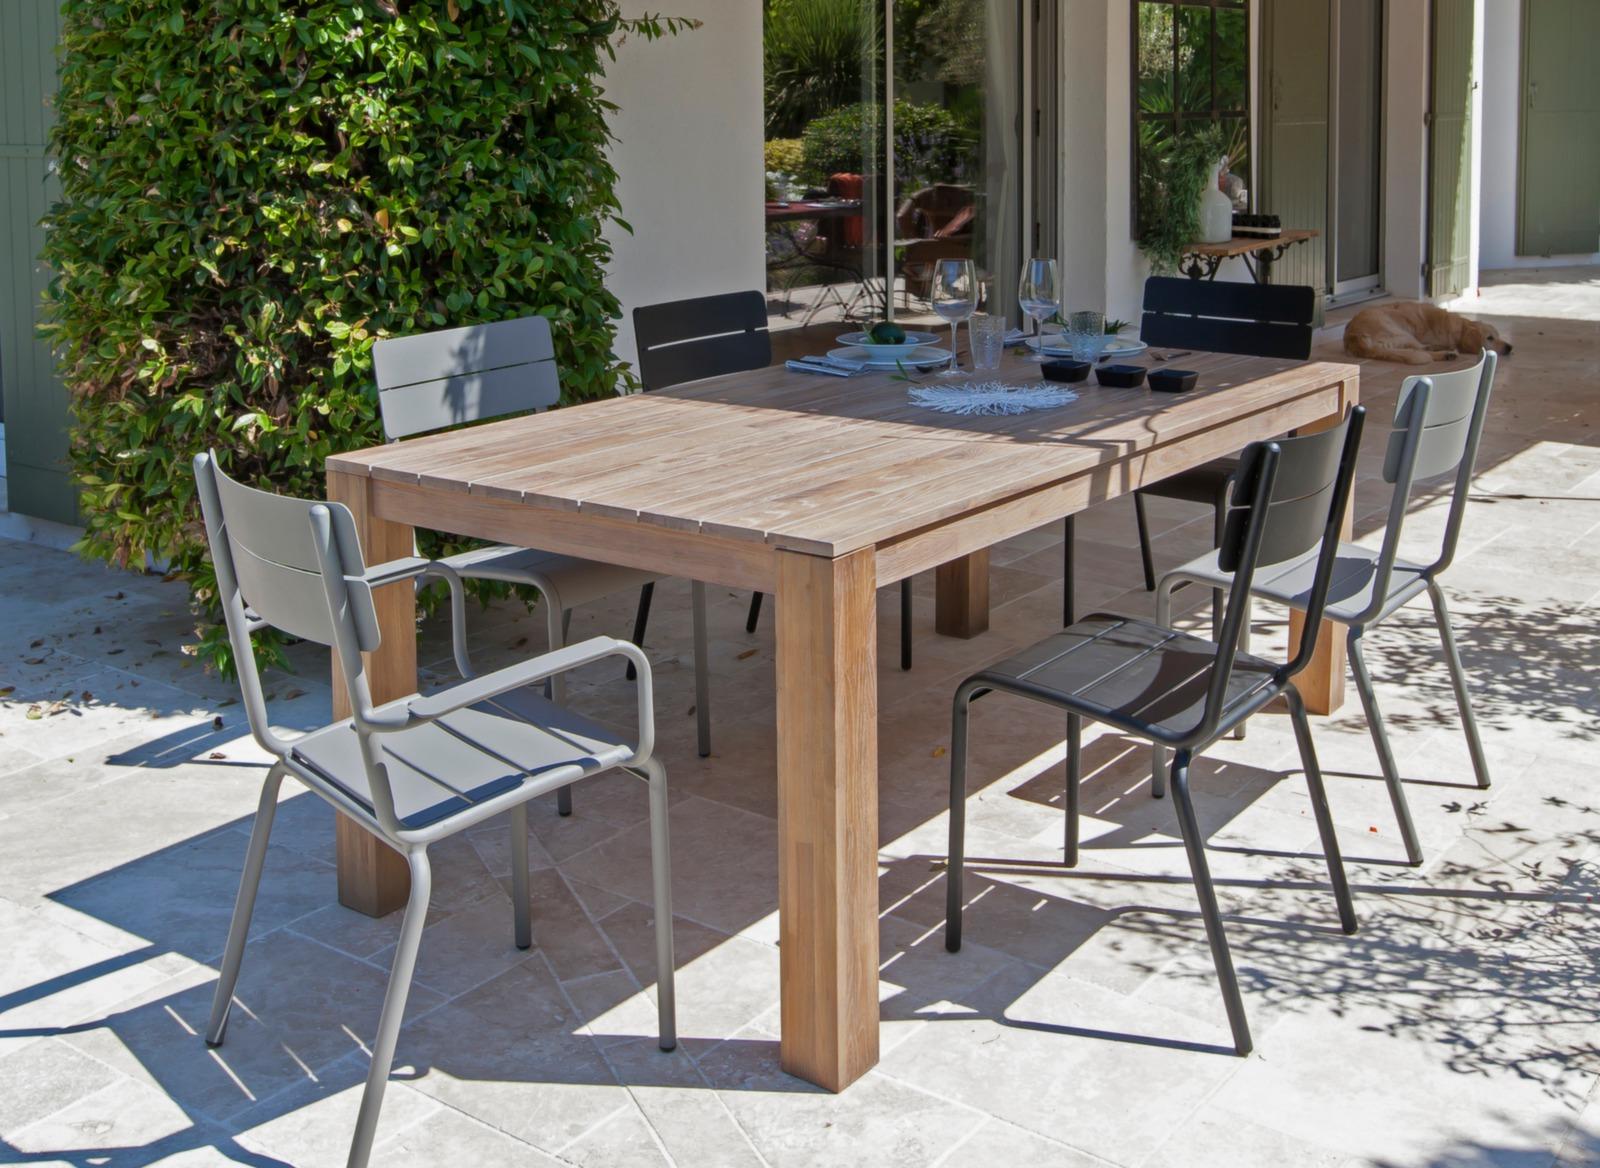 Table de jardin en bois rectangle Kéa - Meubles jardin - Proloisirs